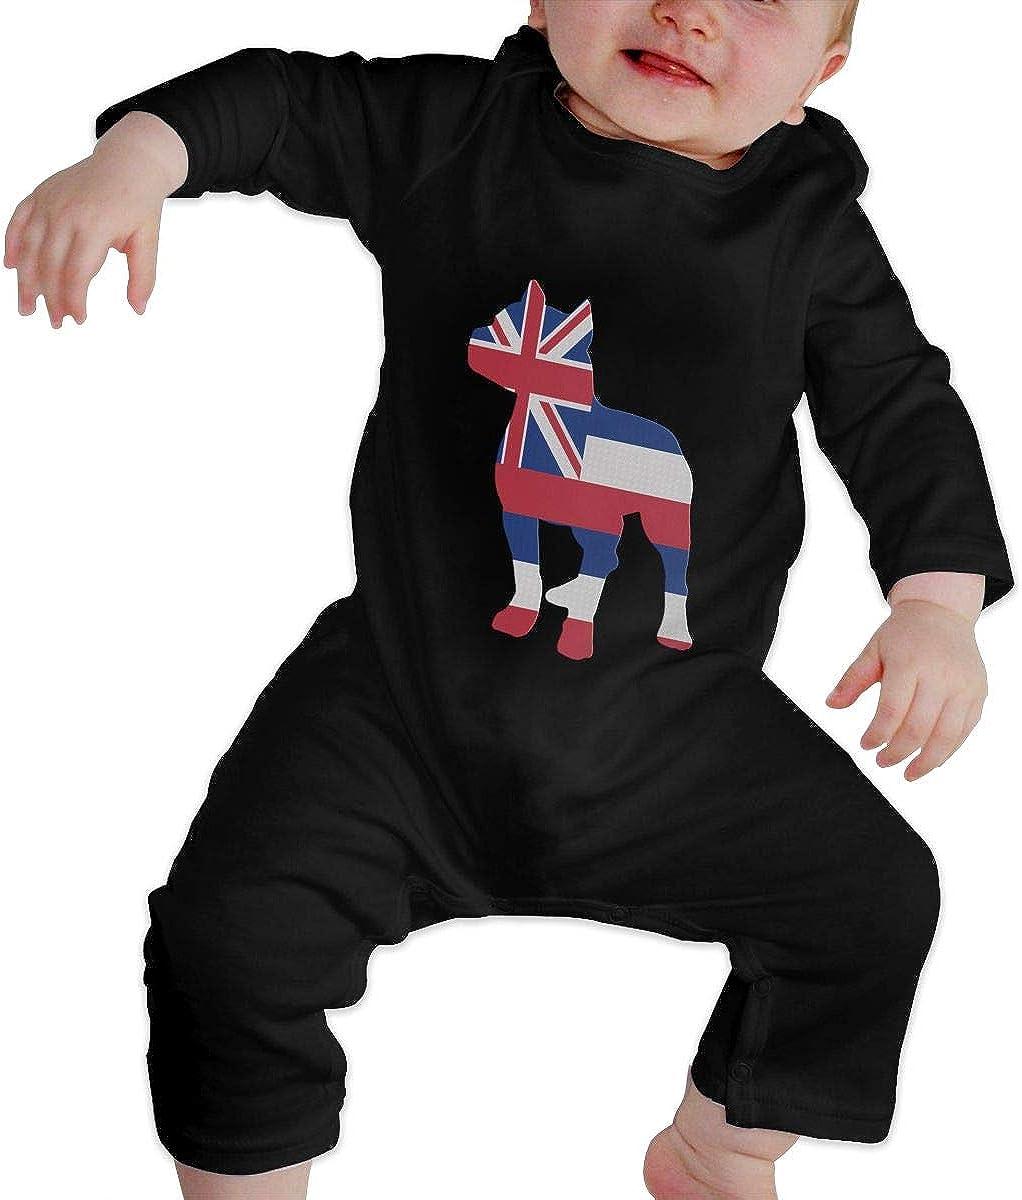 YELTY6F Patriotic Pitbull American Flag Printed Newborn Infant Baby Boy Girl Bodysuit Long Sleeve Rompers Black